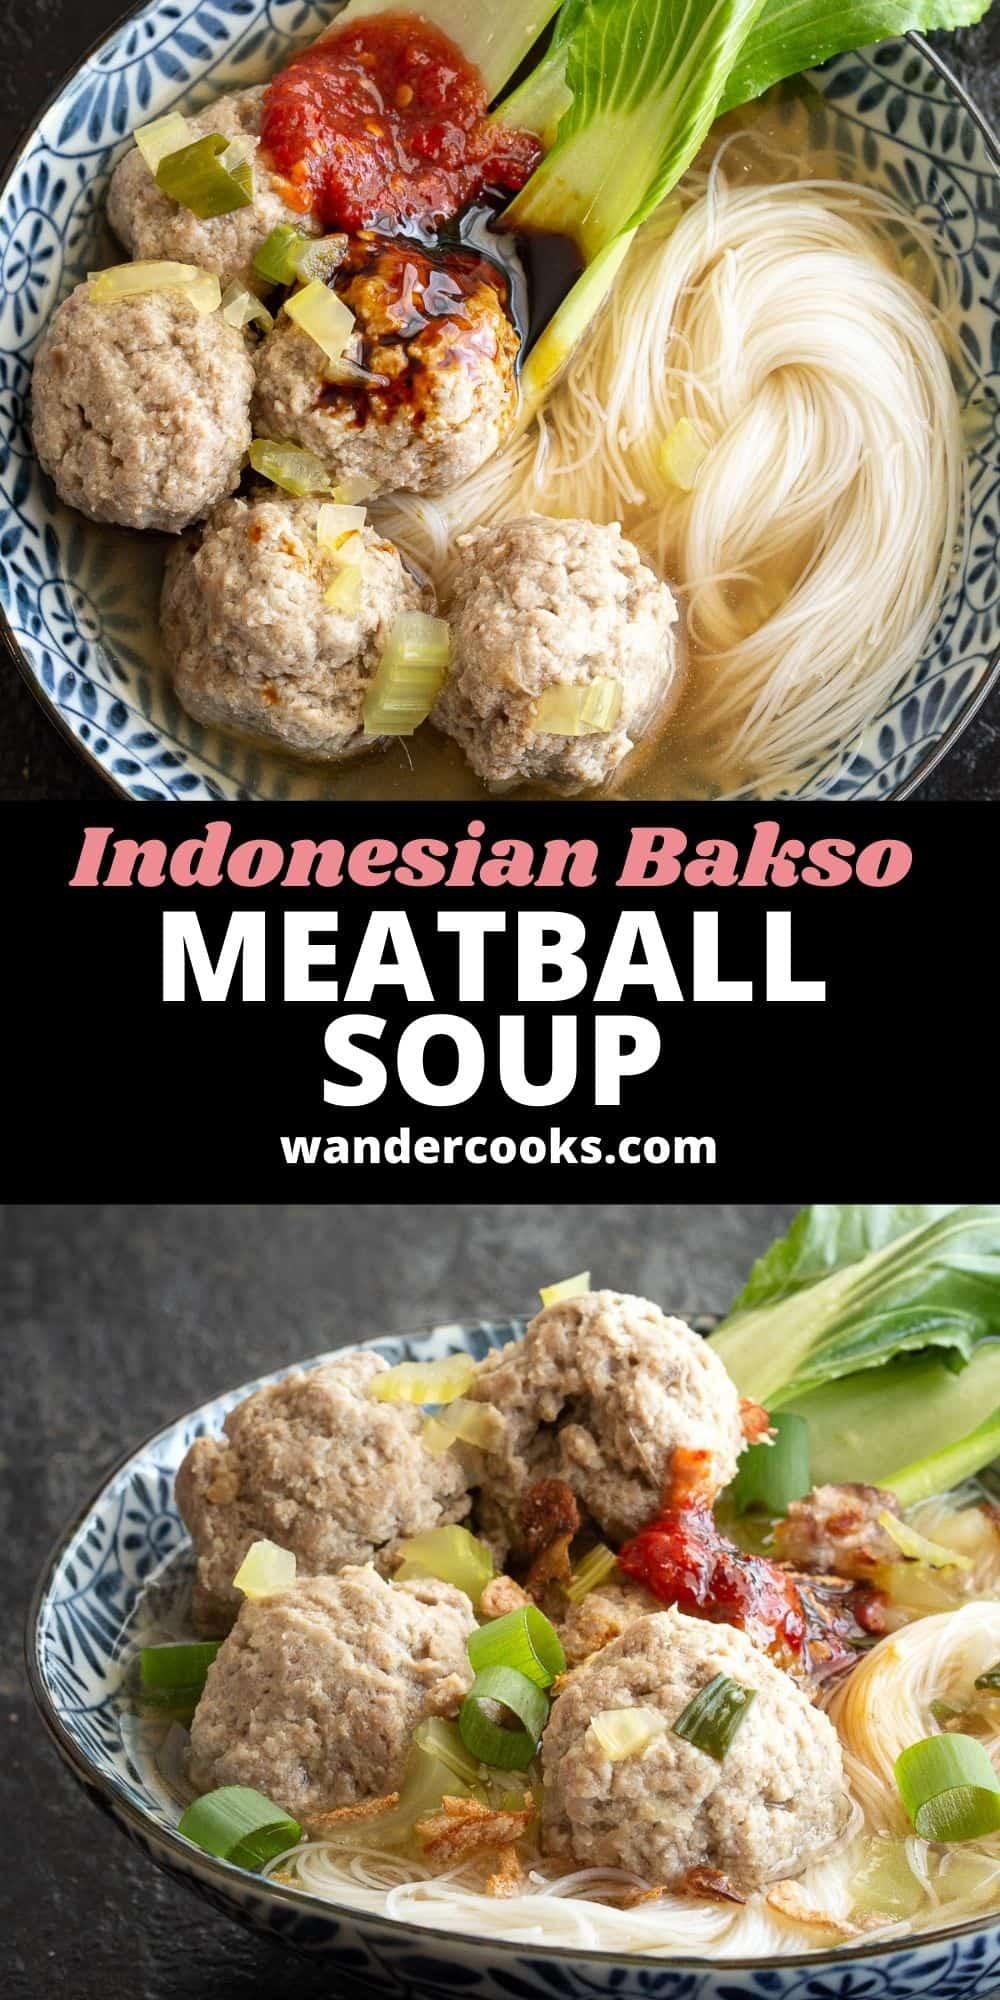 Bakso - Indonesian Meatball Soup (Best Street Food!)